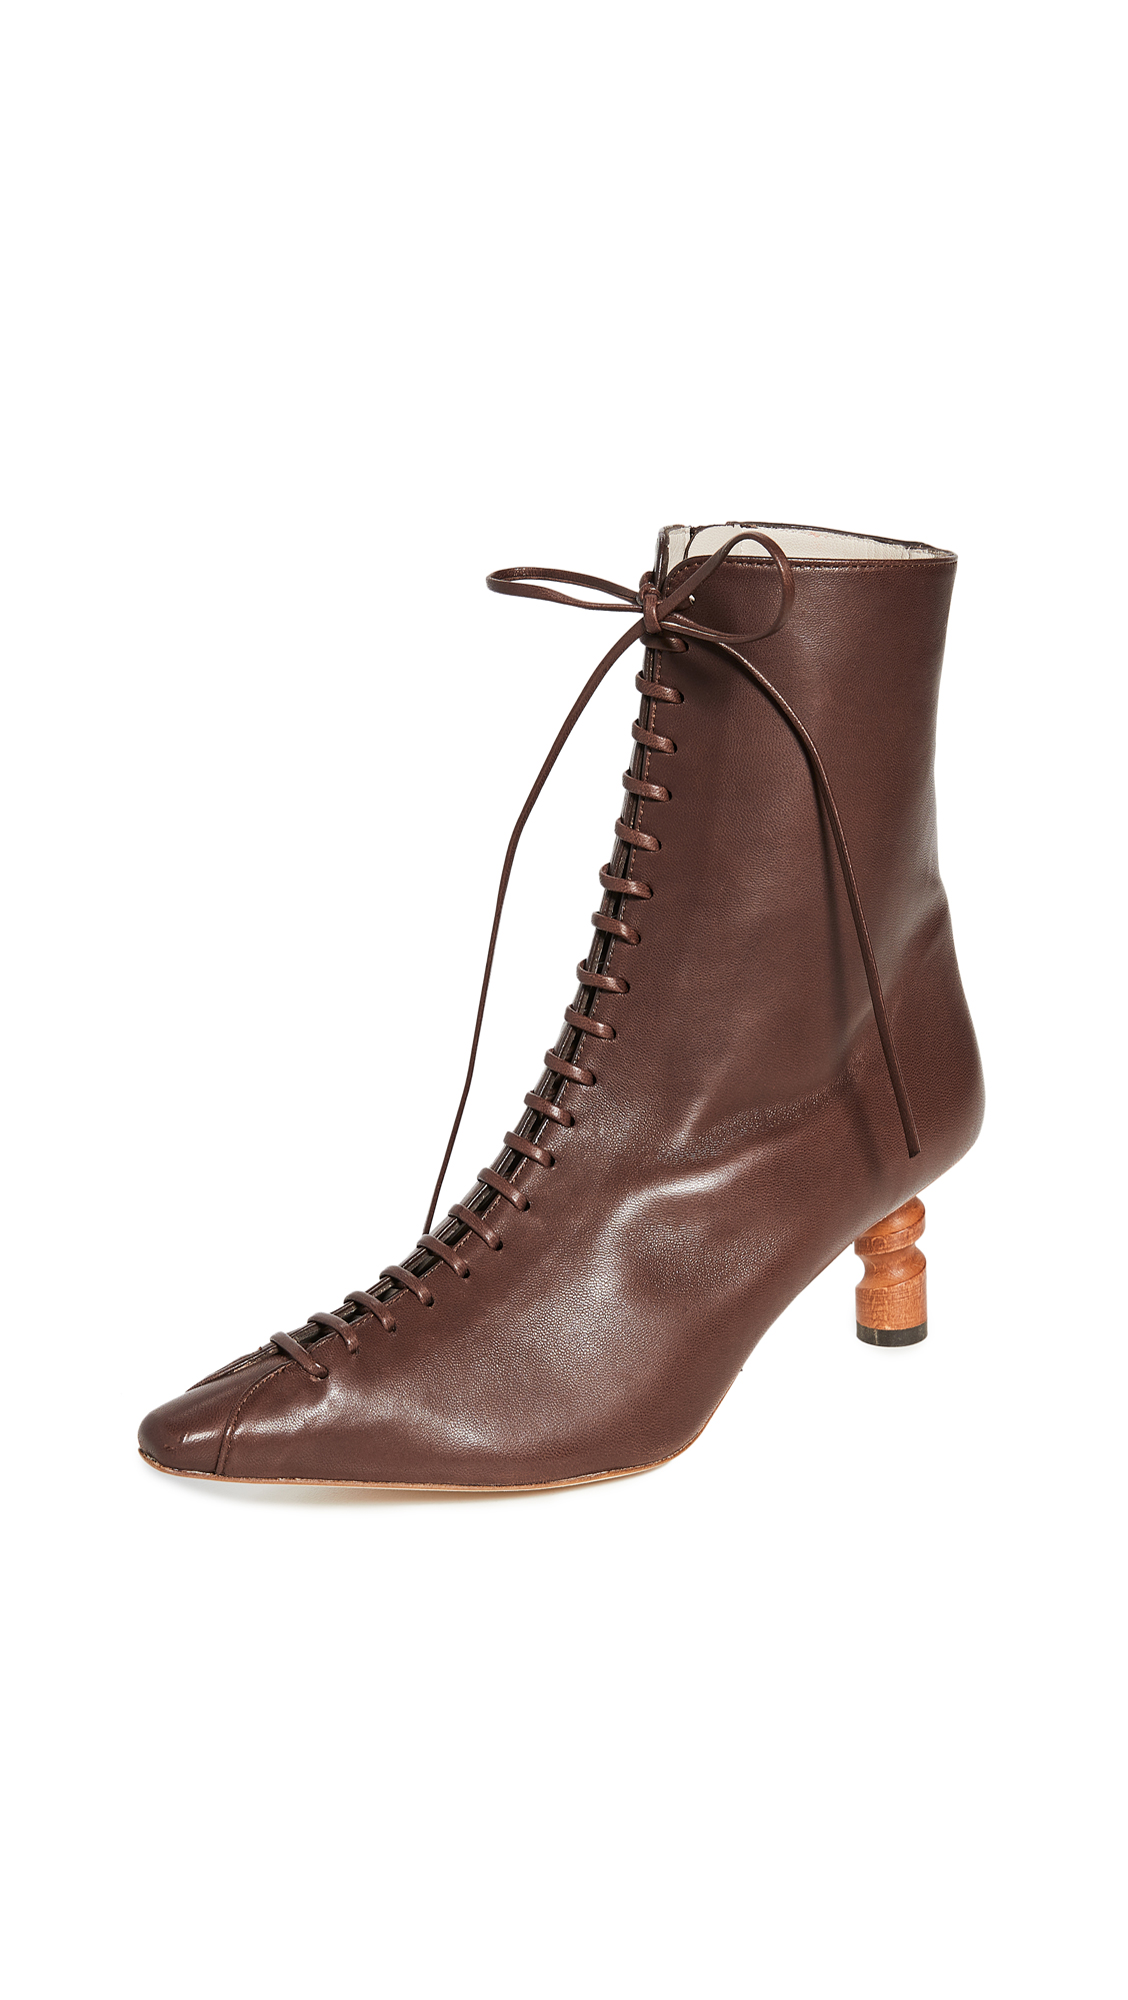 Rejina Pyo Simone Boots - 50% Off Sale